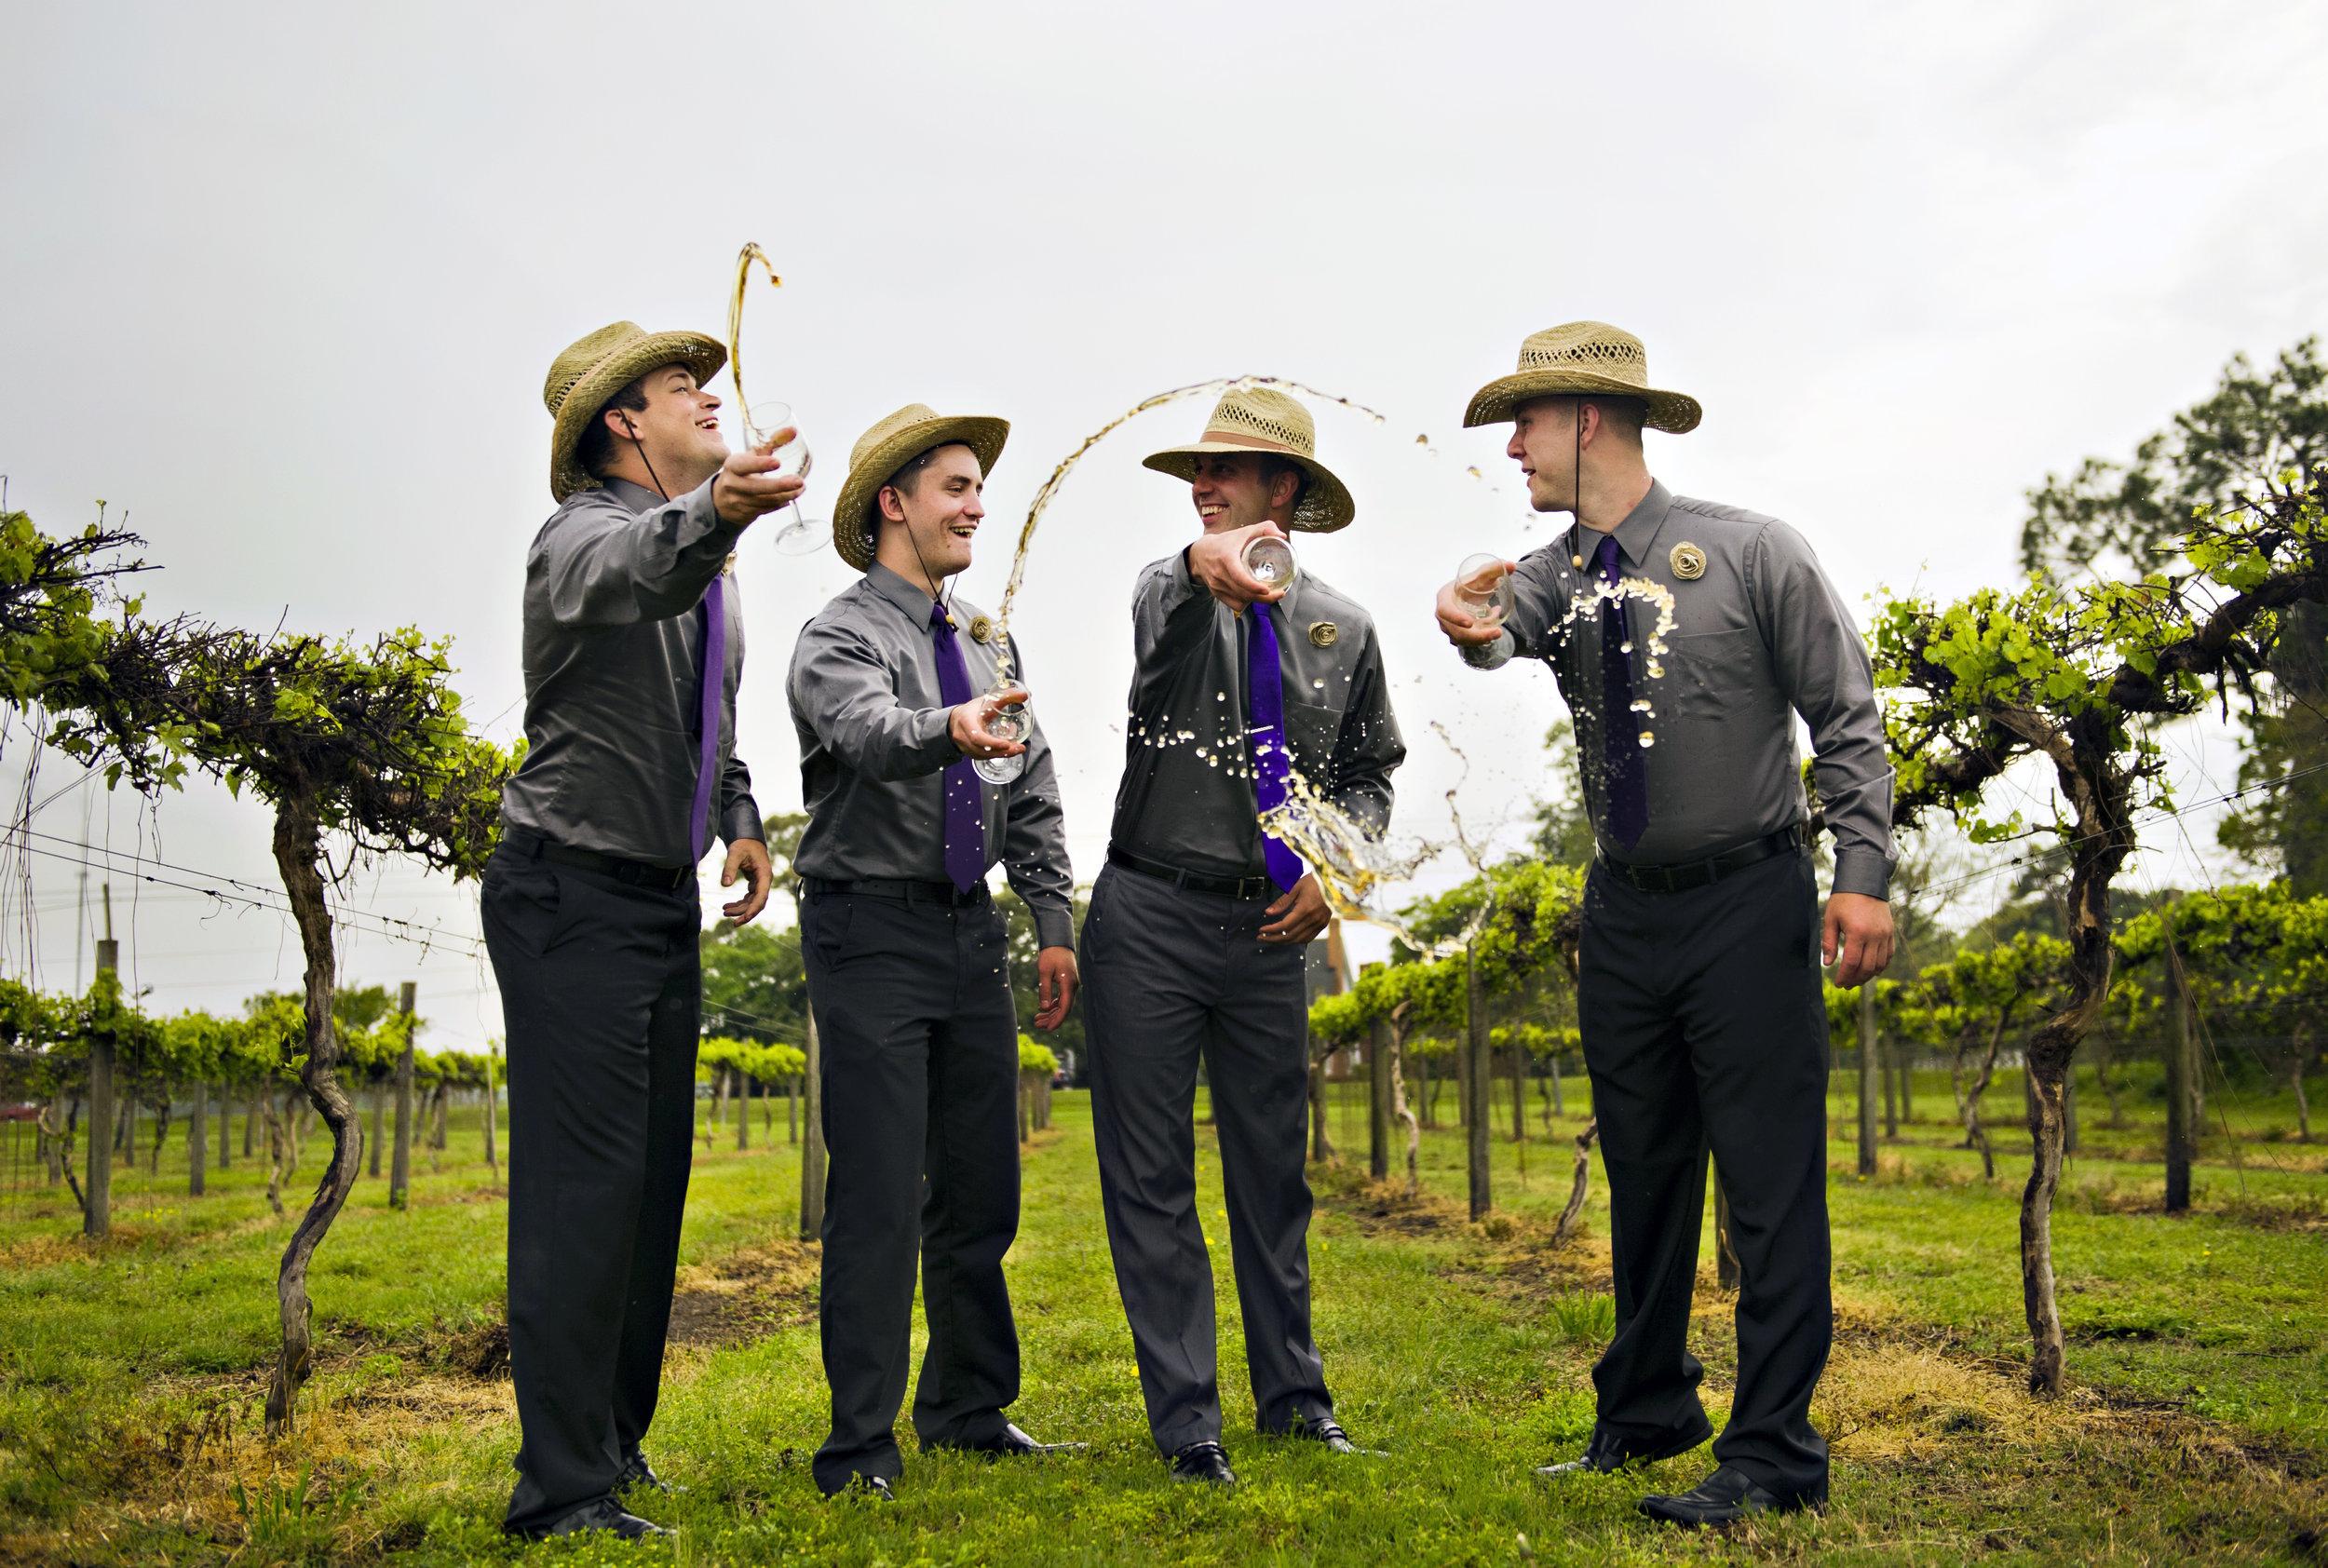 vineyard - weddings at sanctuary vineyards